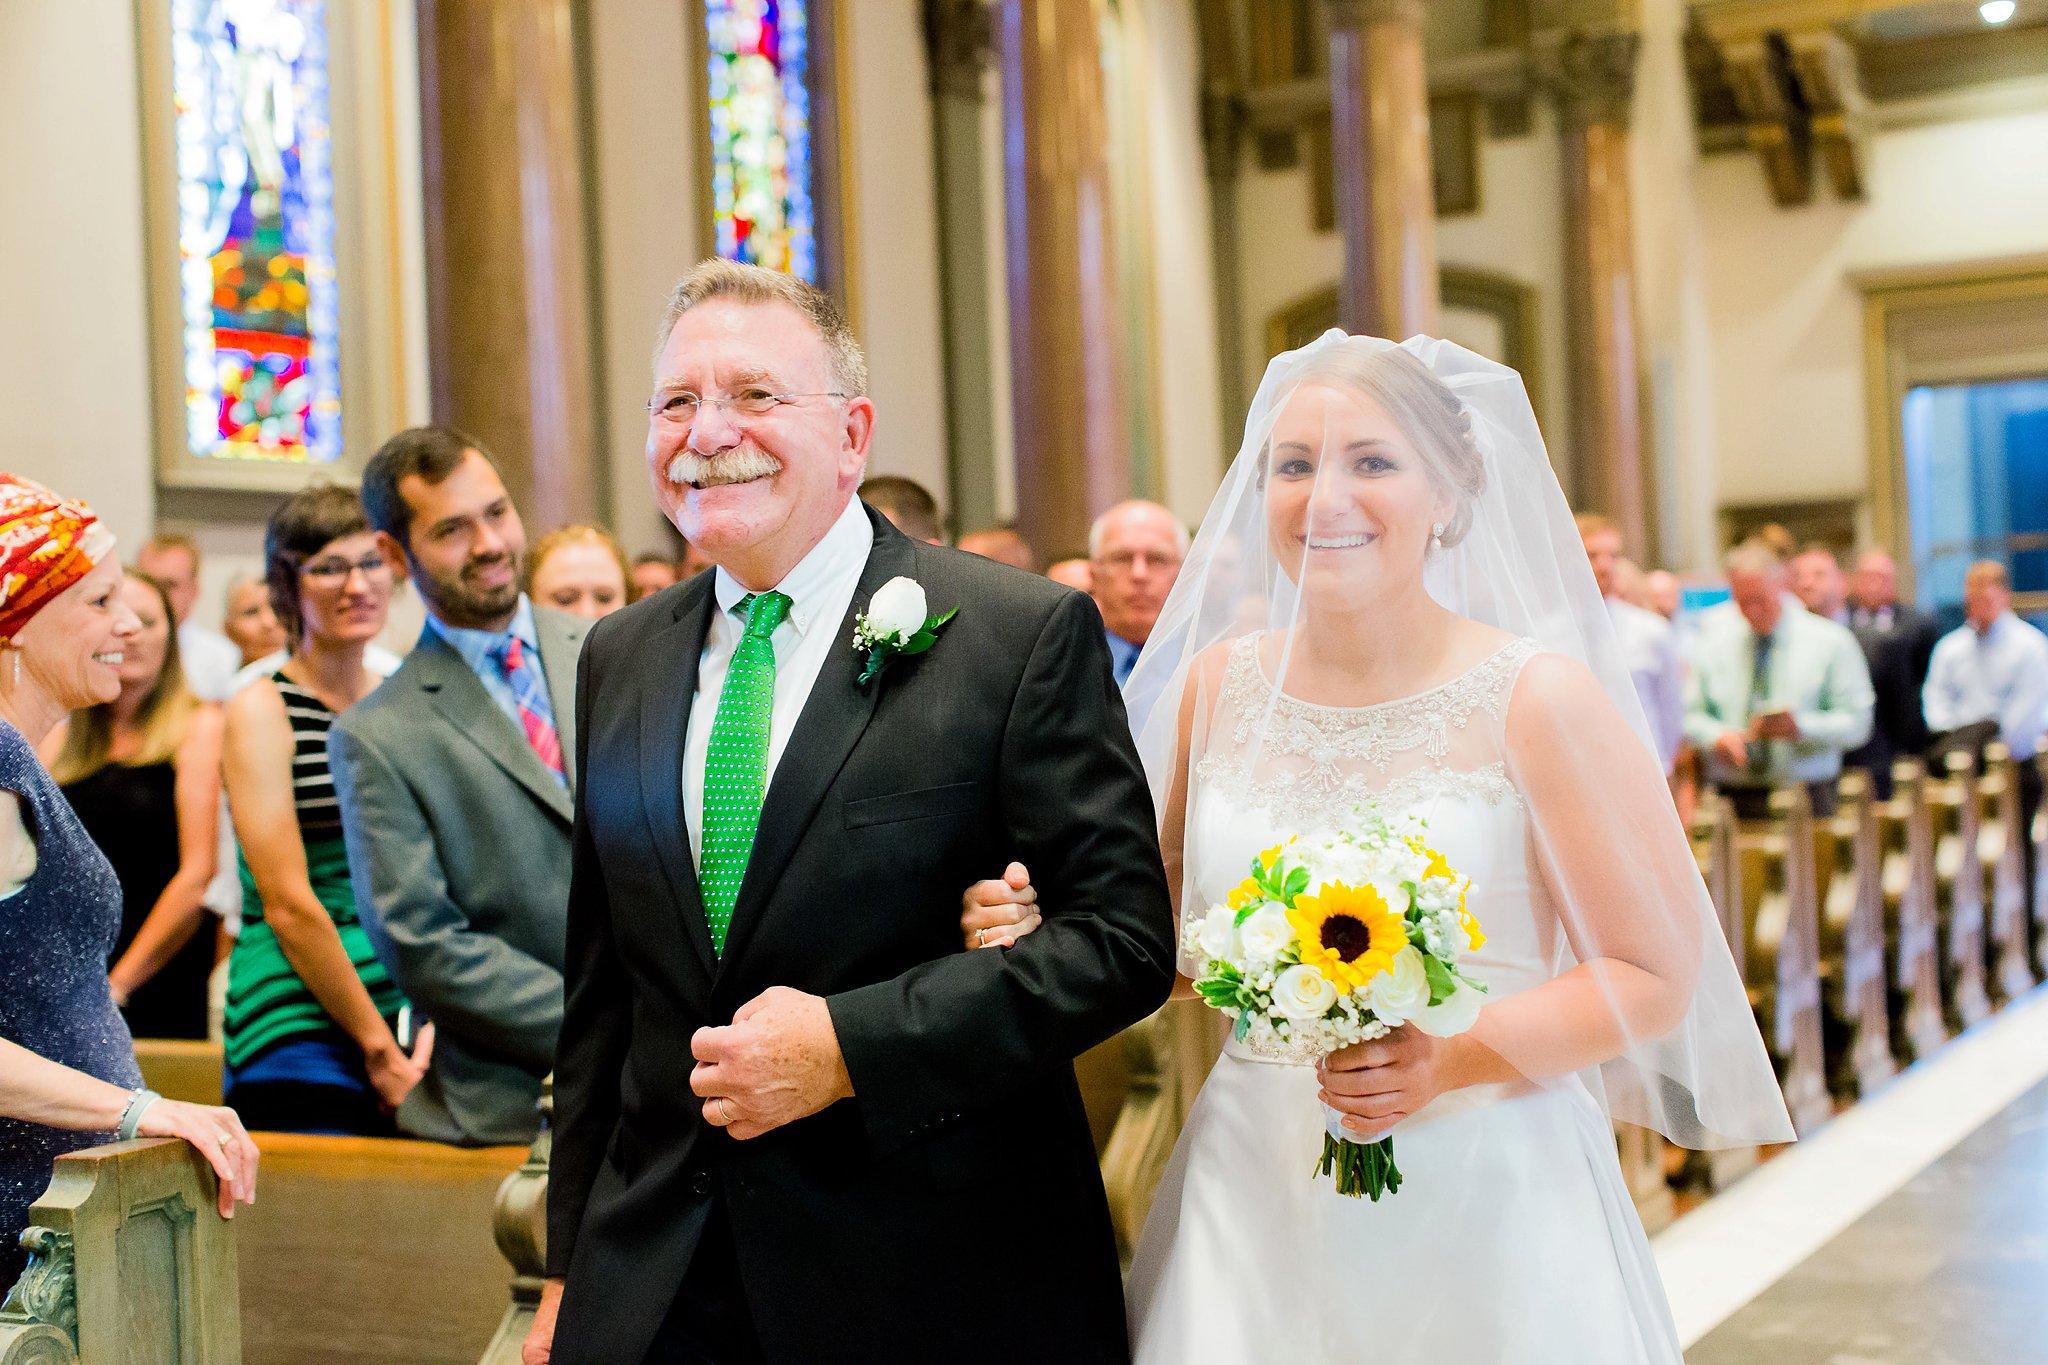 Historic Tredegar Wedding Richmond Wedding Photographer Maggie & Alan Megan Kelsey Photography-91.jpg